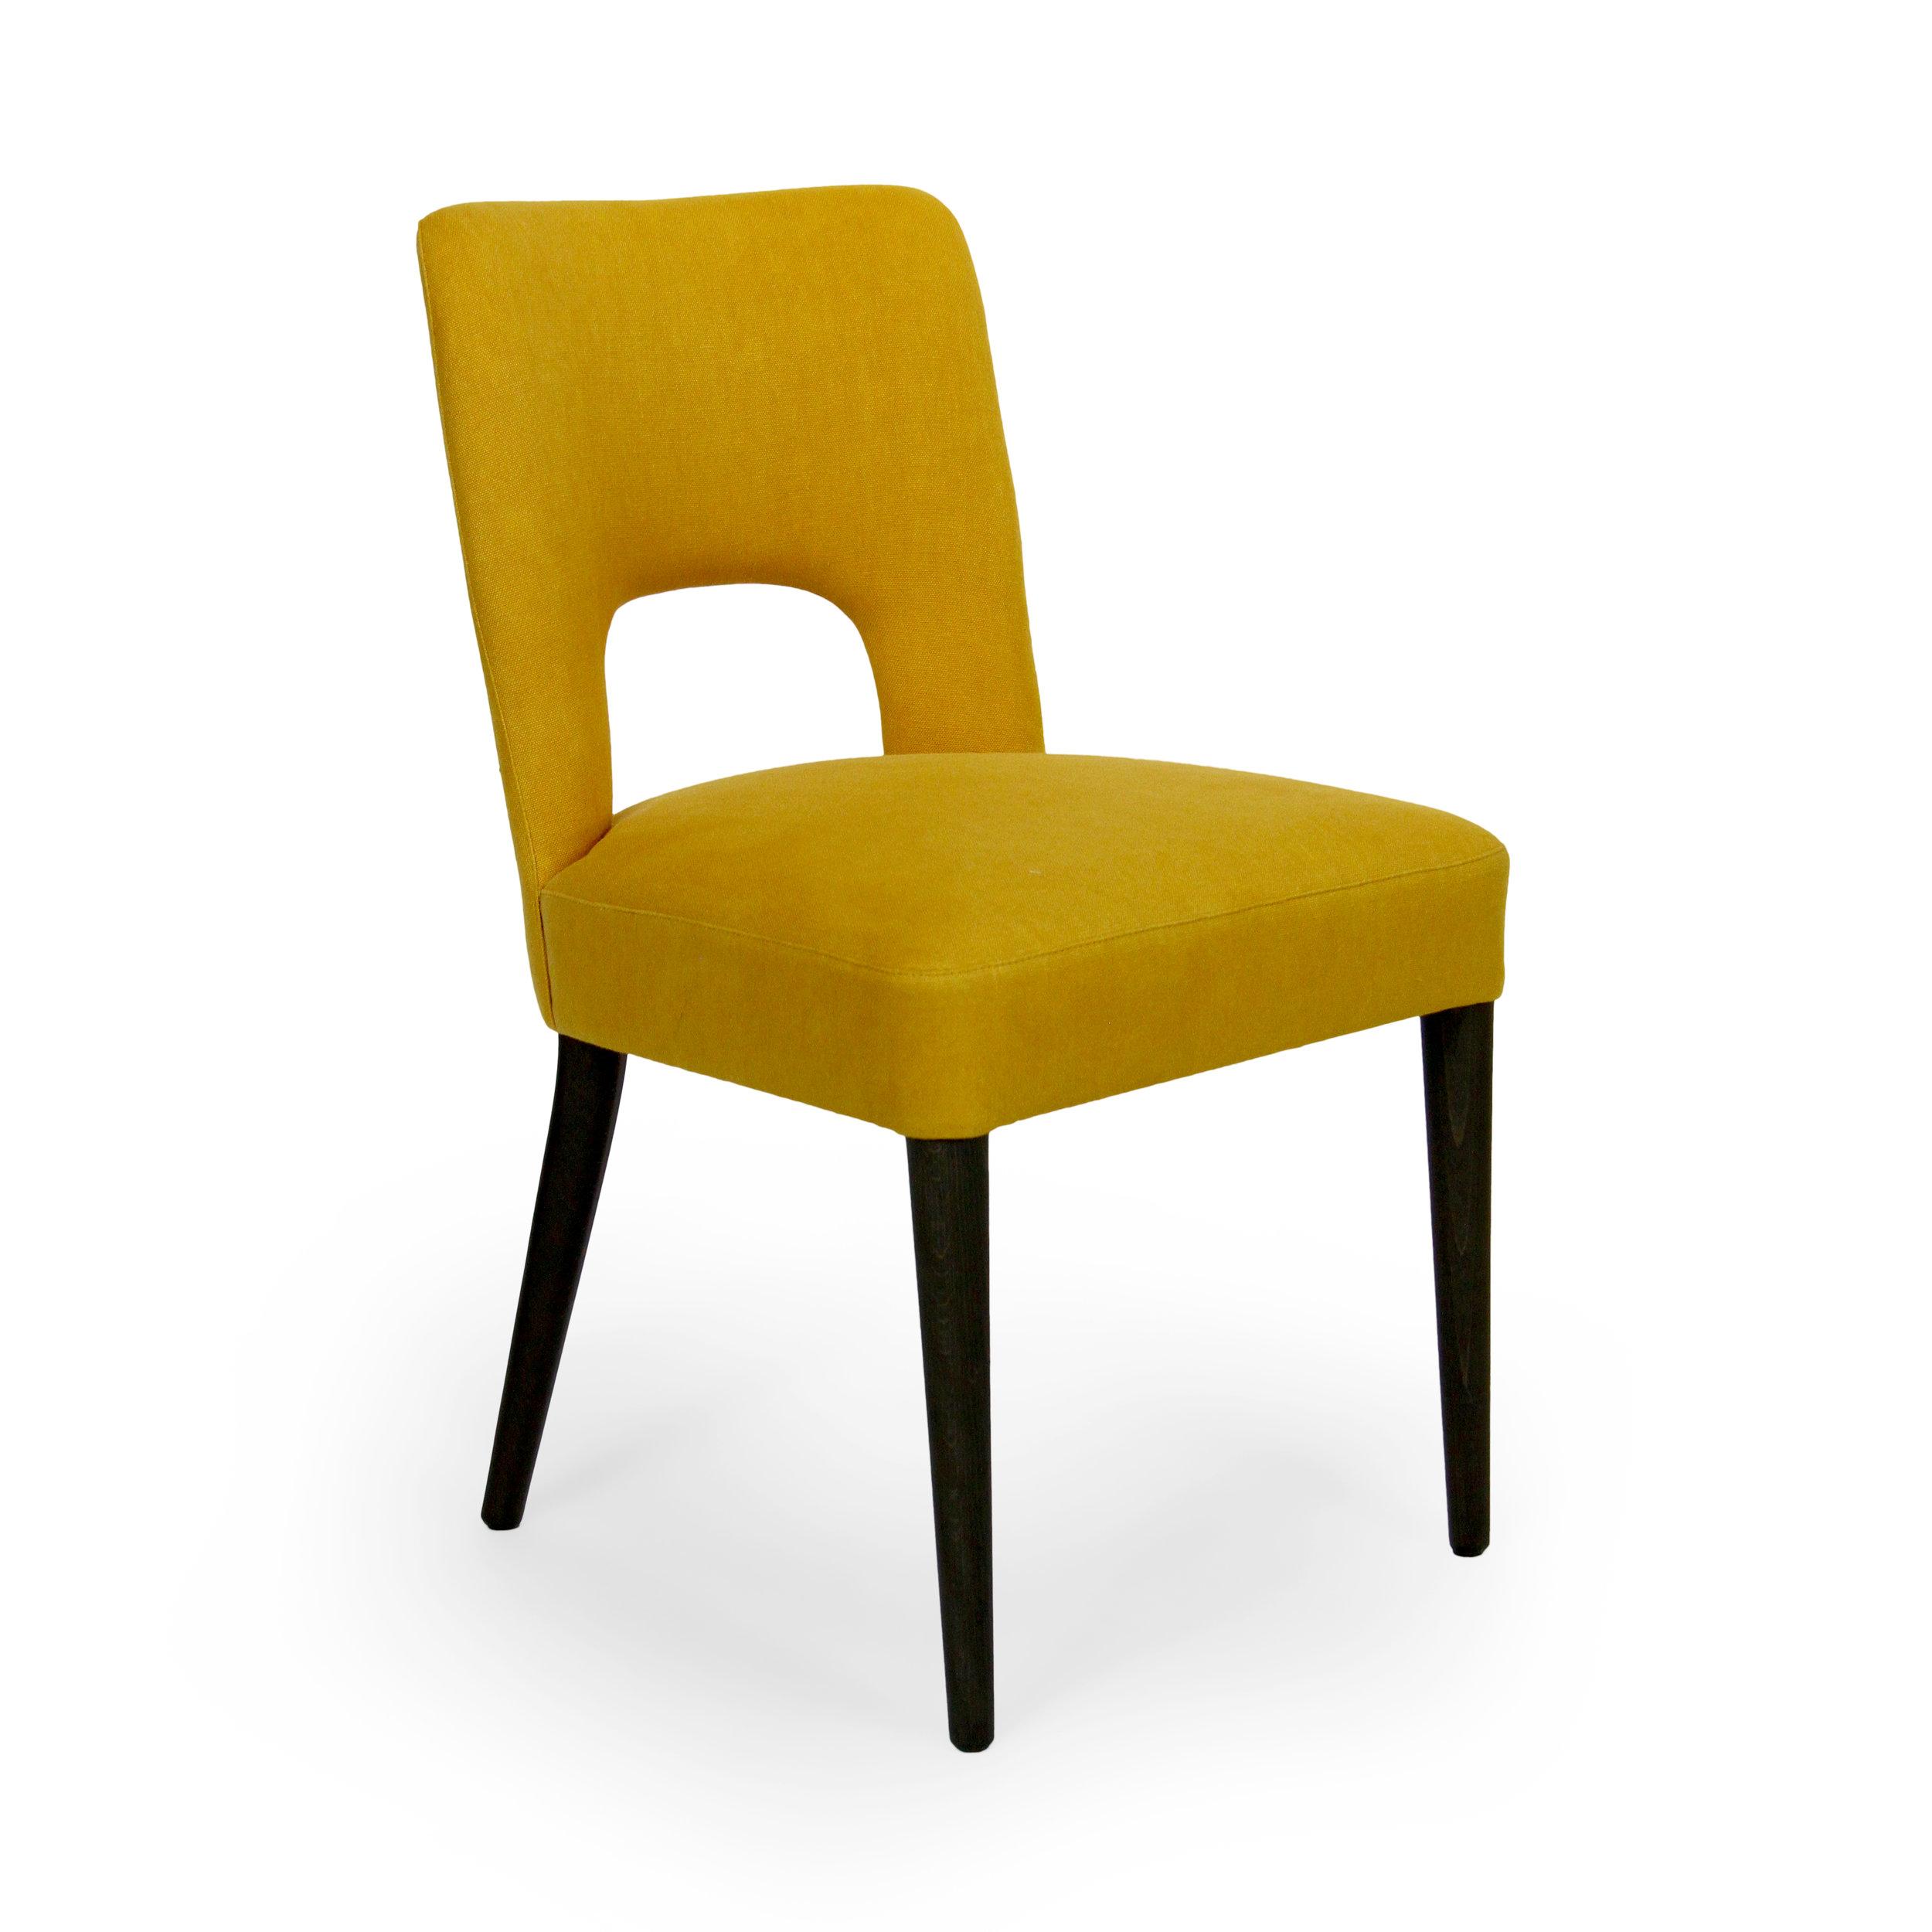 maries-corner-chair-logan